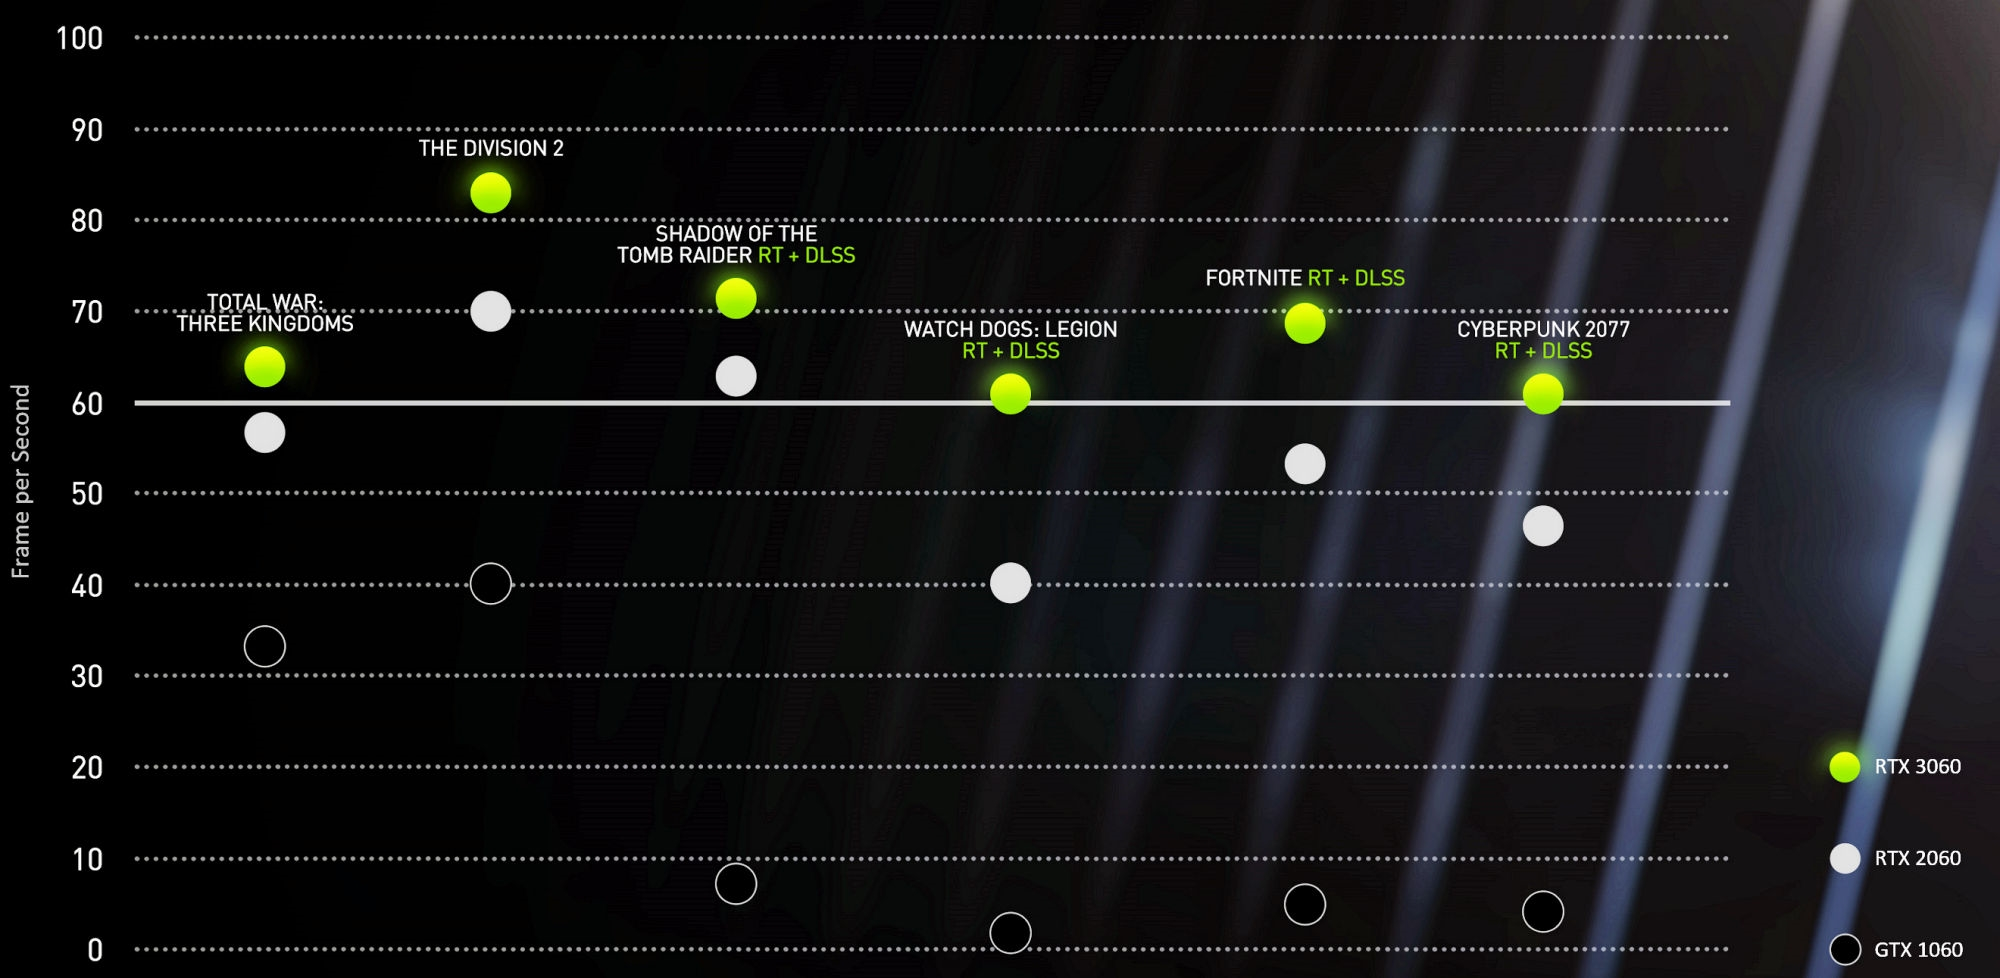 消息称NVIDIA正积极备货 欲复活RTX 2060/2060 Super